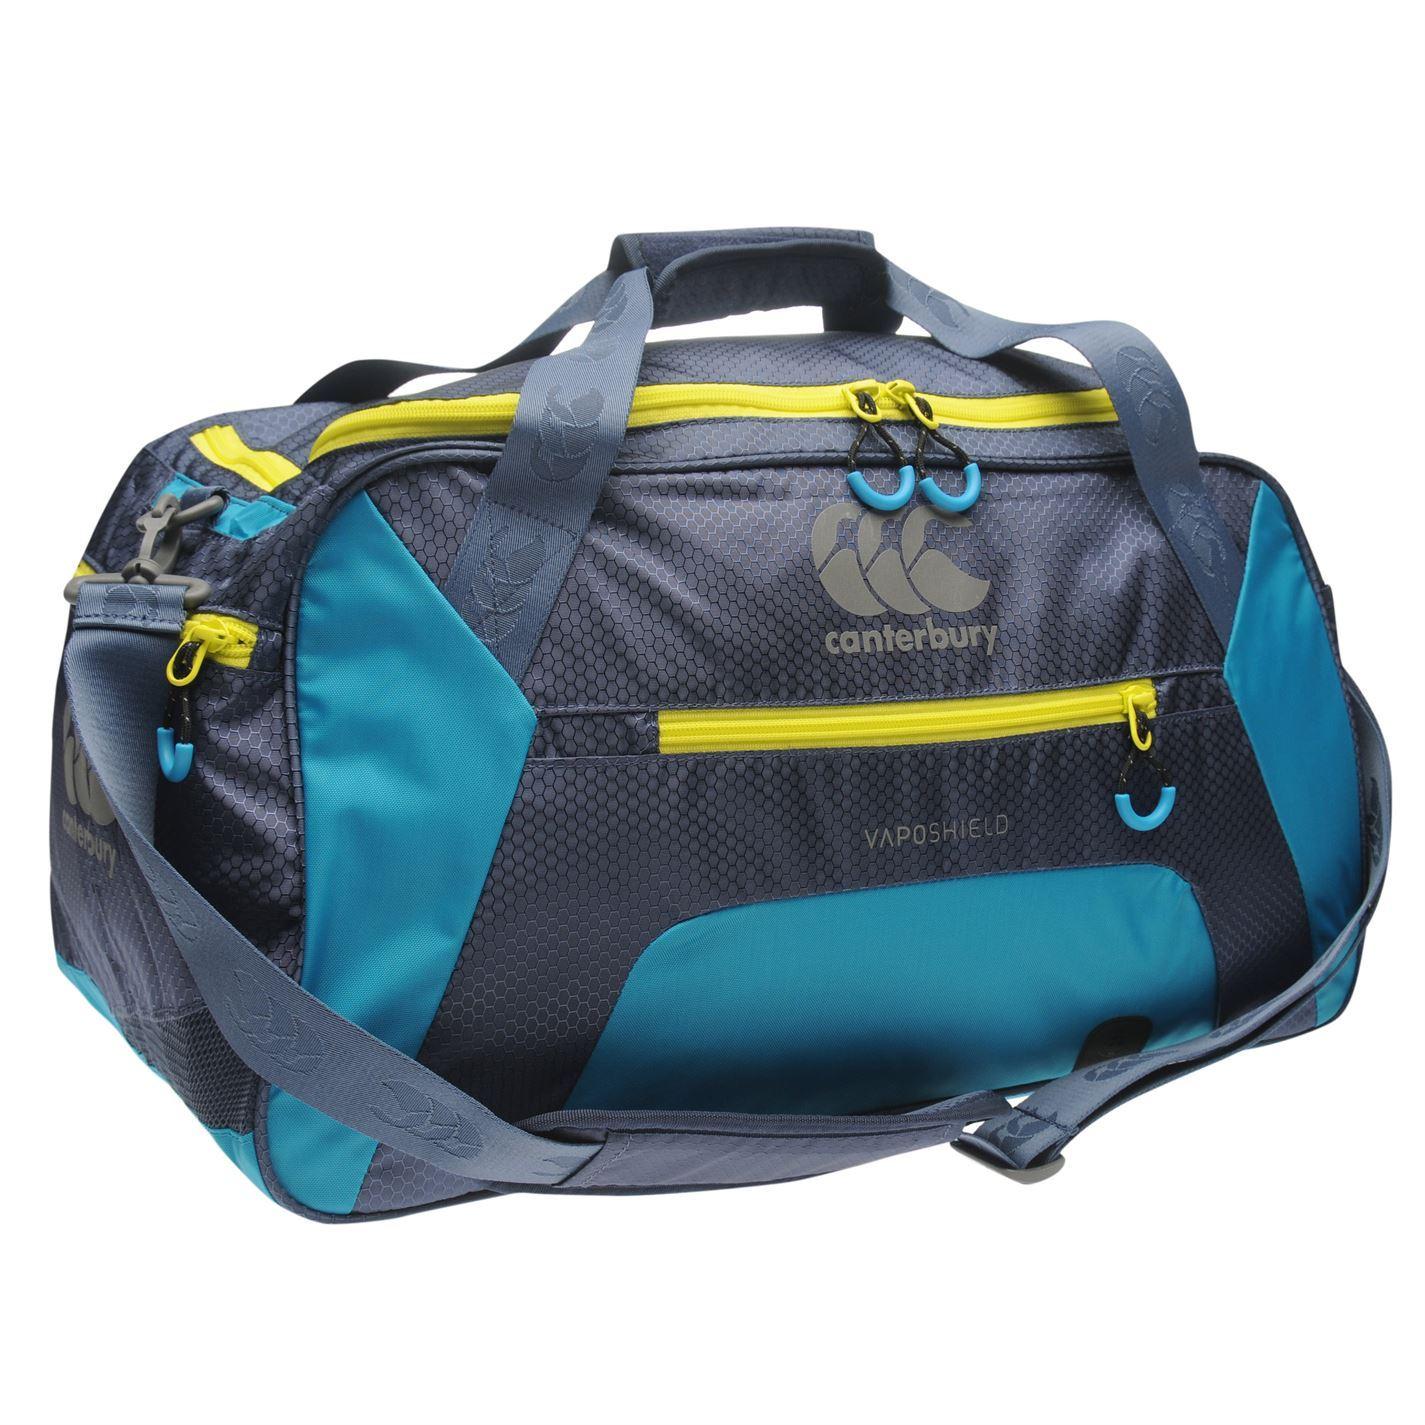 c74225bf7b ... Canterbury Medium Holdall Indigo Sports Kit Bag Gymbag Carryall ...